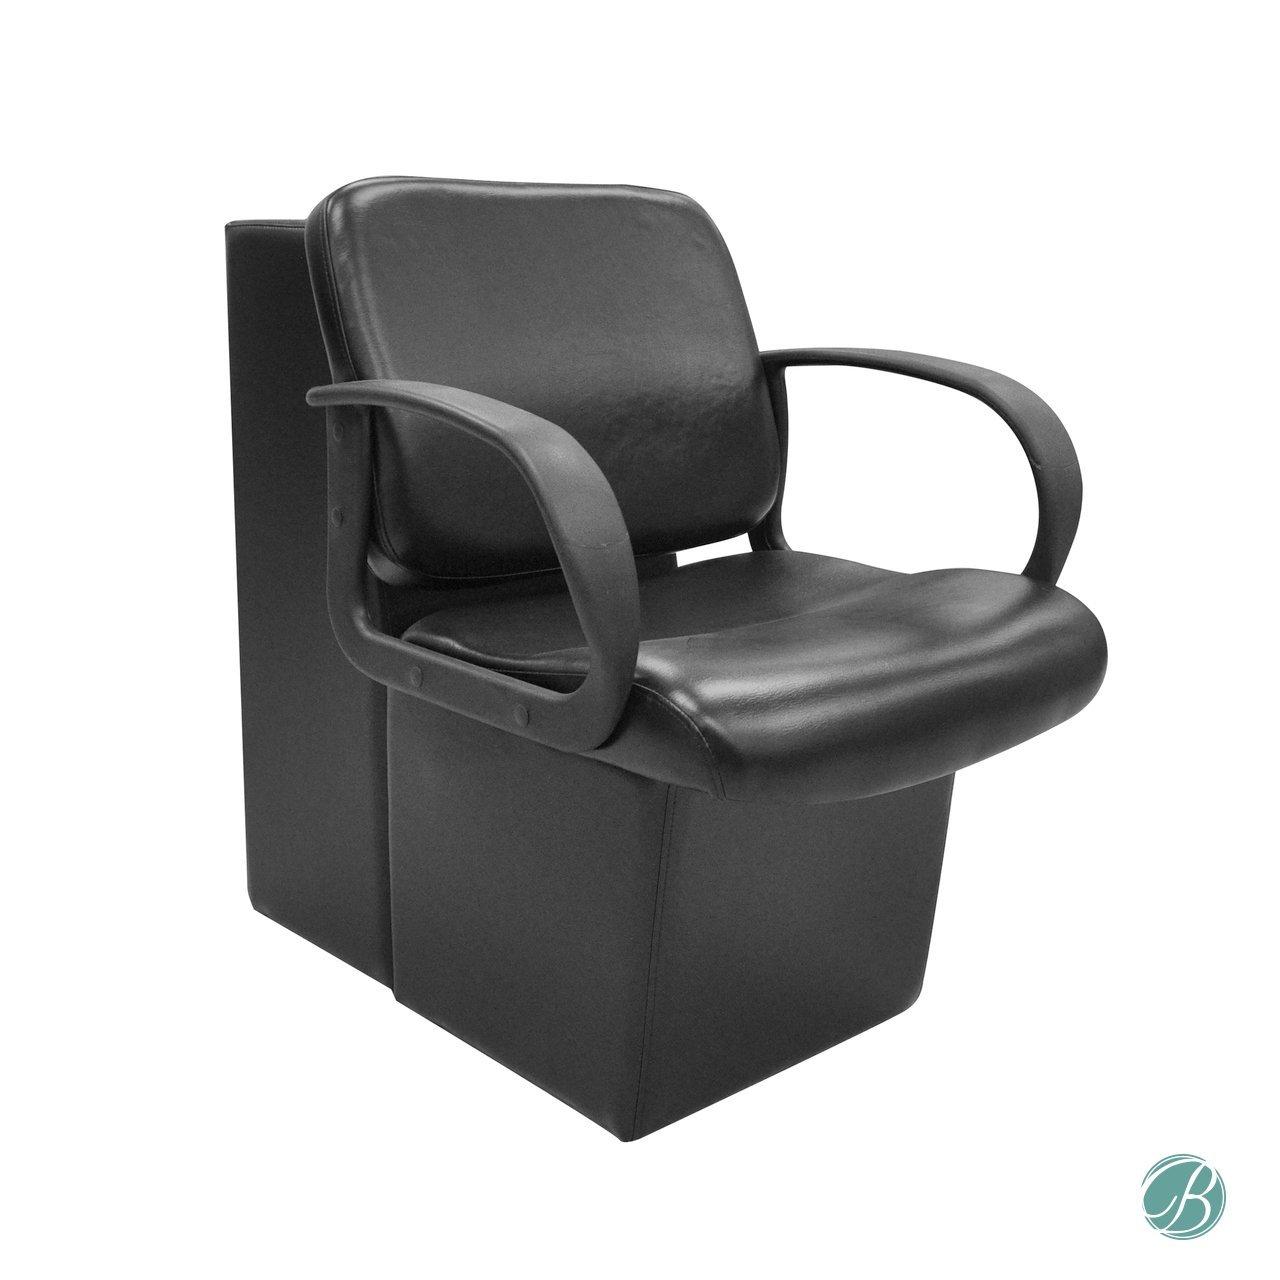 Get Quotations · HAMILTON HAIR DRYER CHAIR Salon Spa Barber Black color Salon Equipment  sc 1 st  Shopping Guide - Alibaba & Cheap Vintage Hair Salon Chair find Vintage Hair Salon Chair deals ...